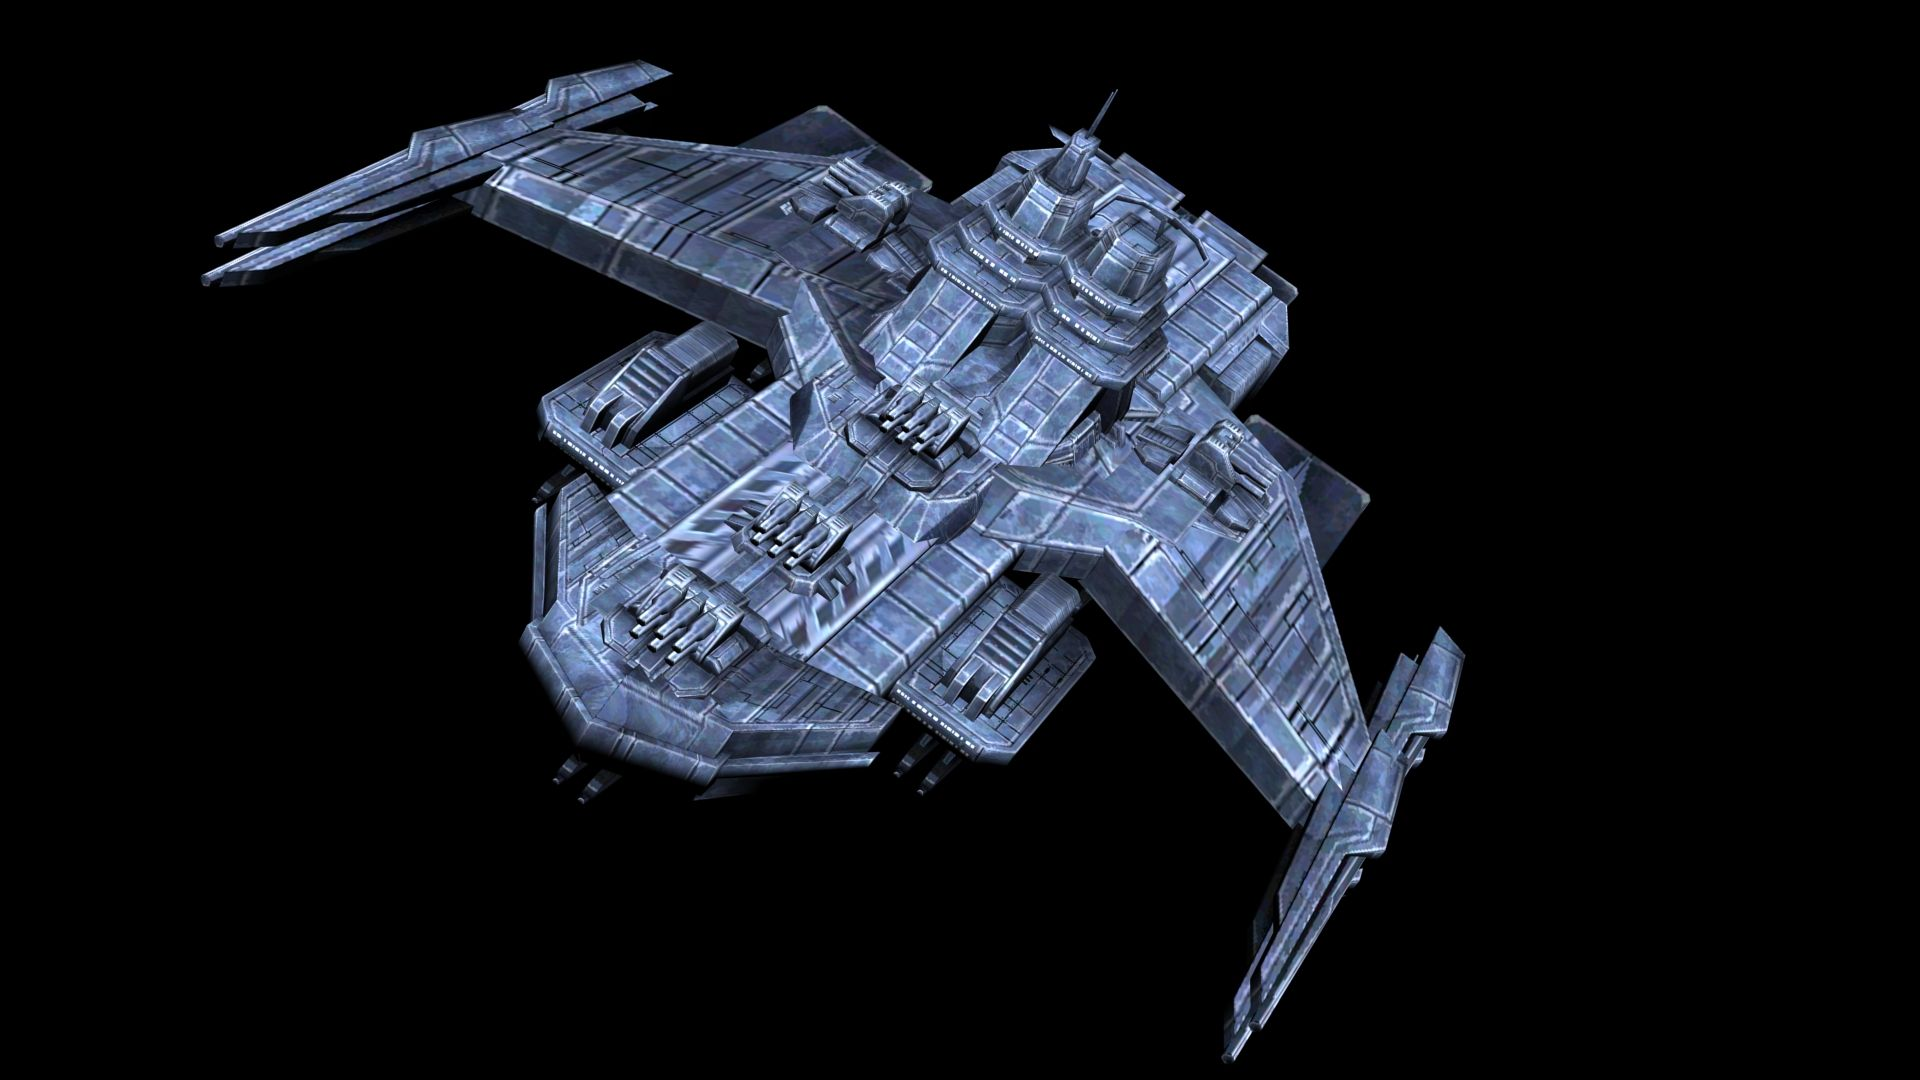 Experimental Uef Spaceship Image